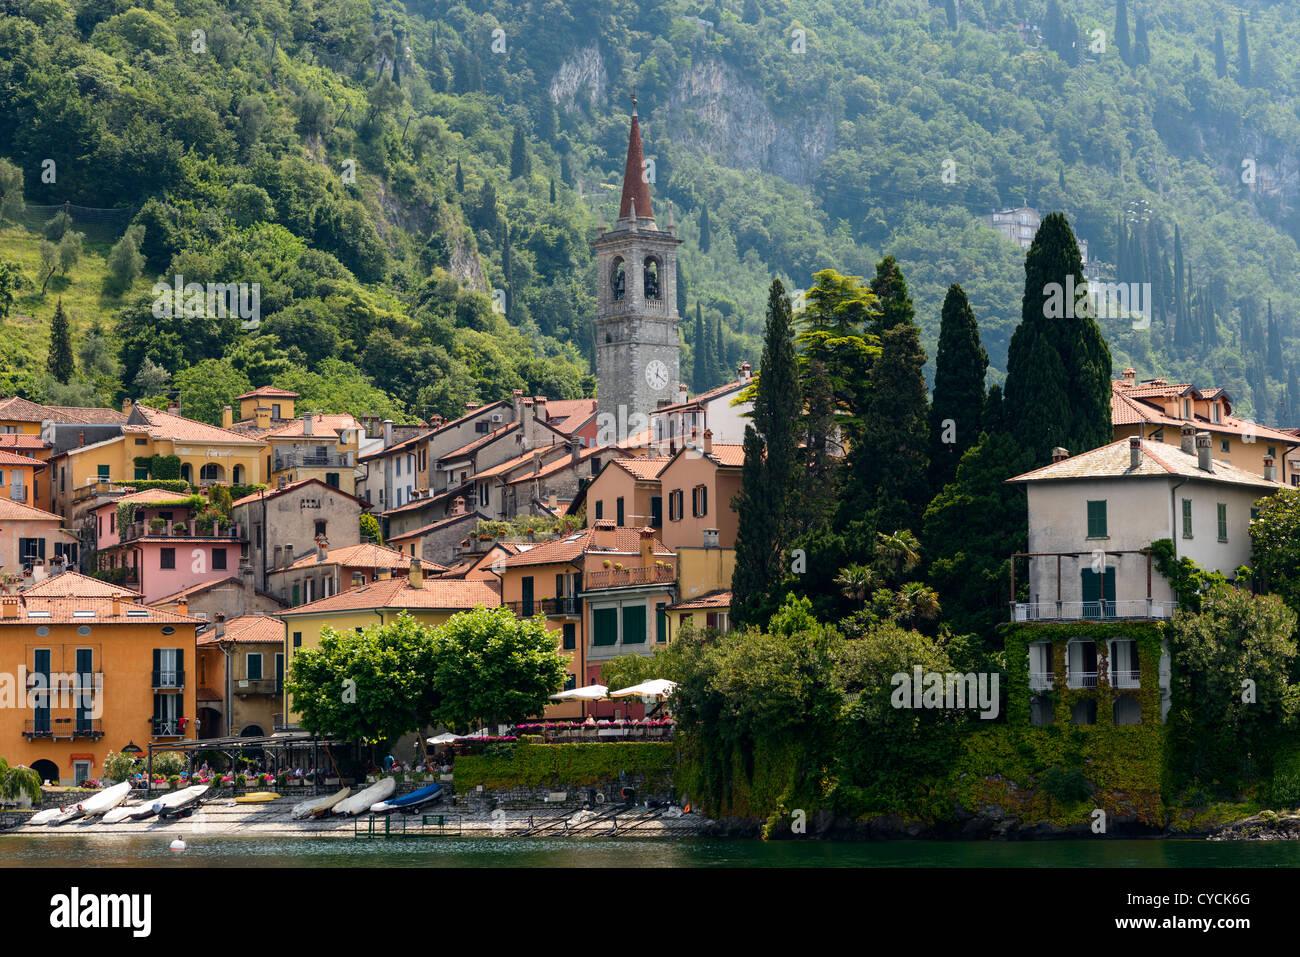 Varenna, Lake Como, Italy, Europe - Stock Image